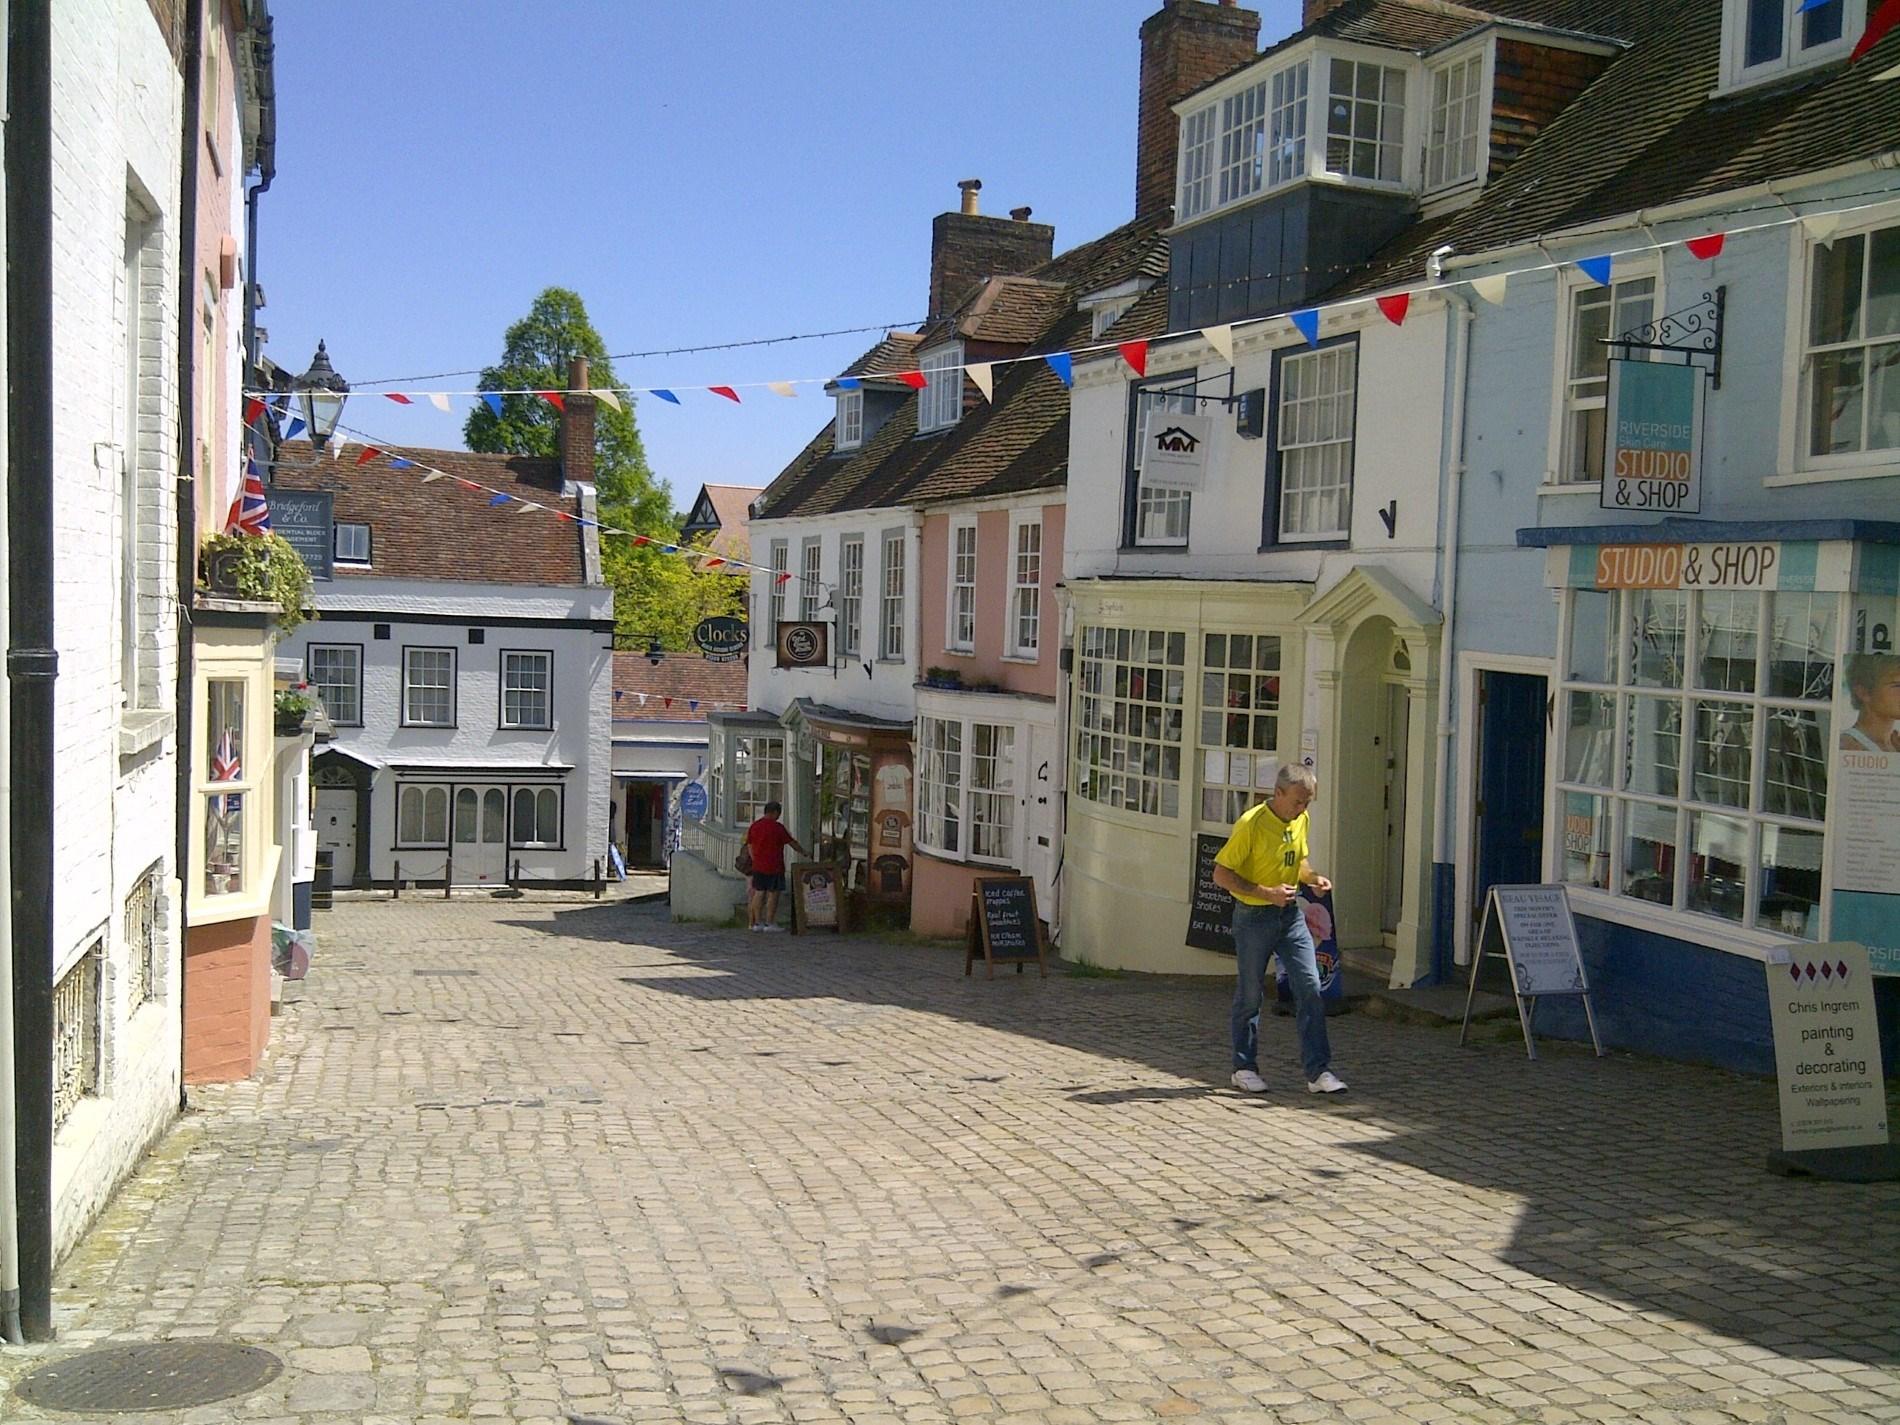 Lymington Cobbles well worth a visit